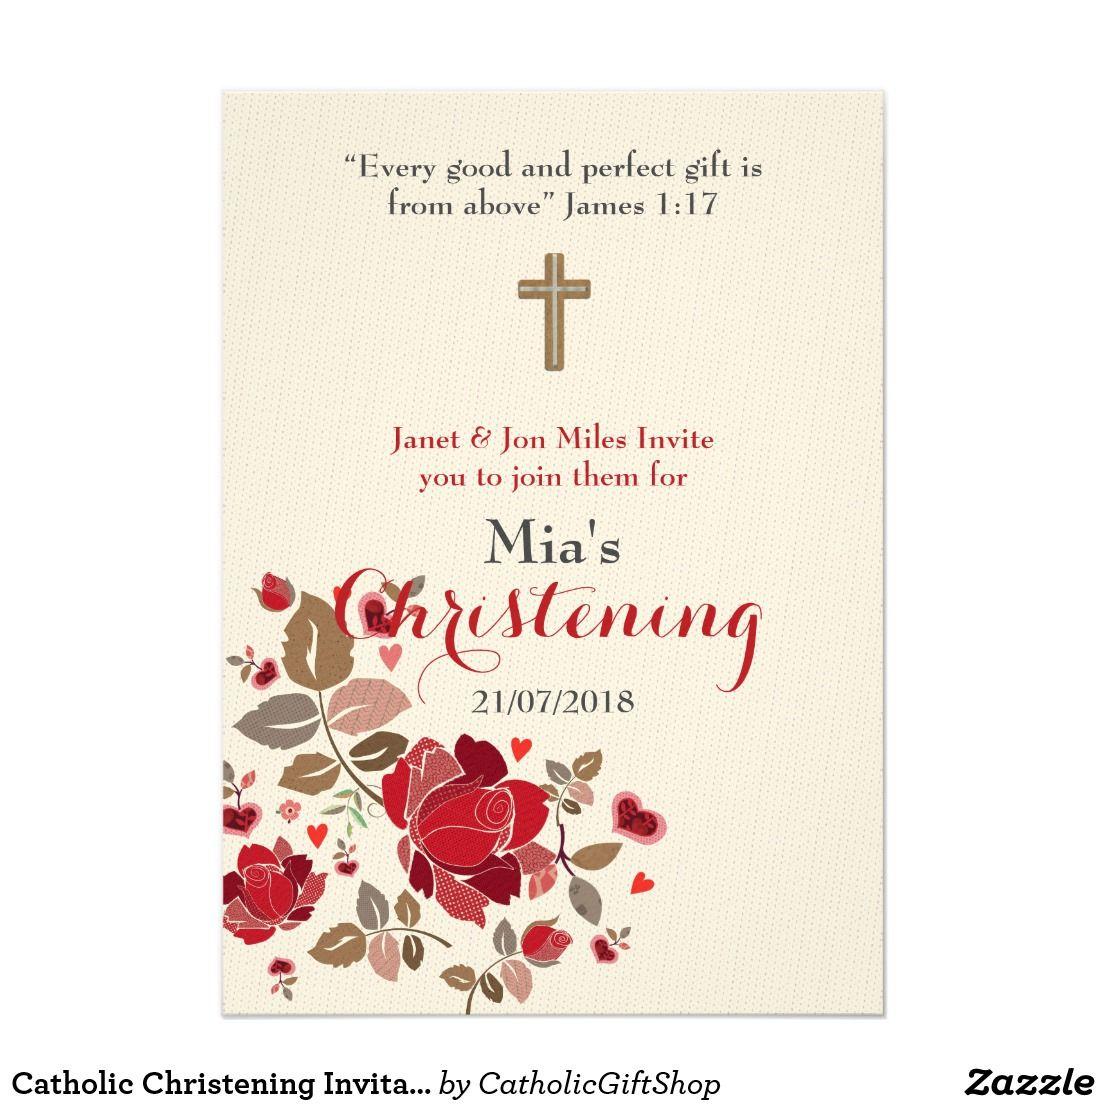 Catholic Christening Invitation Burgundy Floral